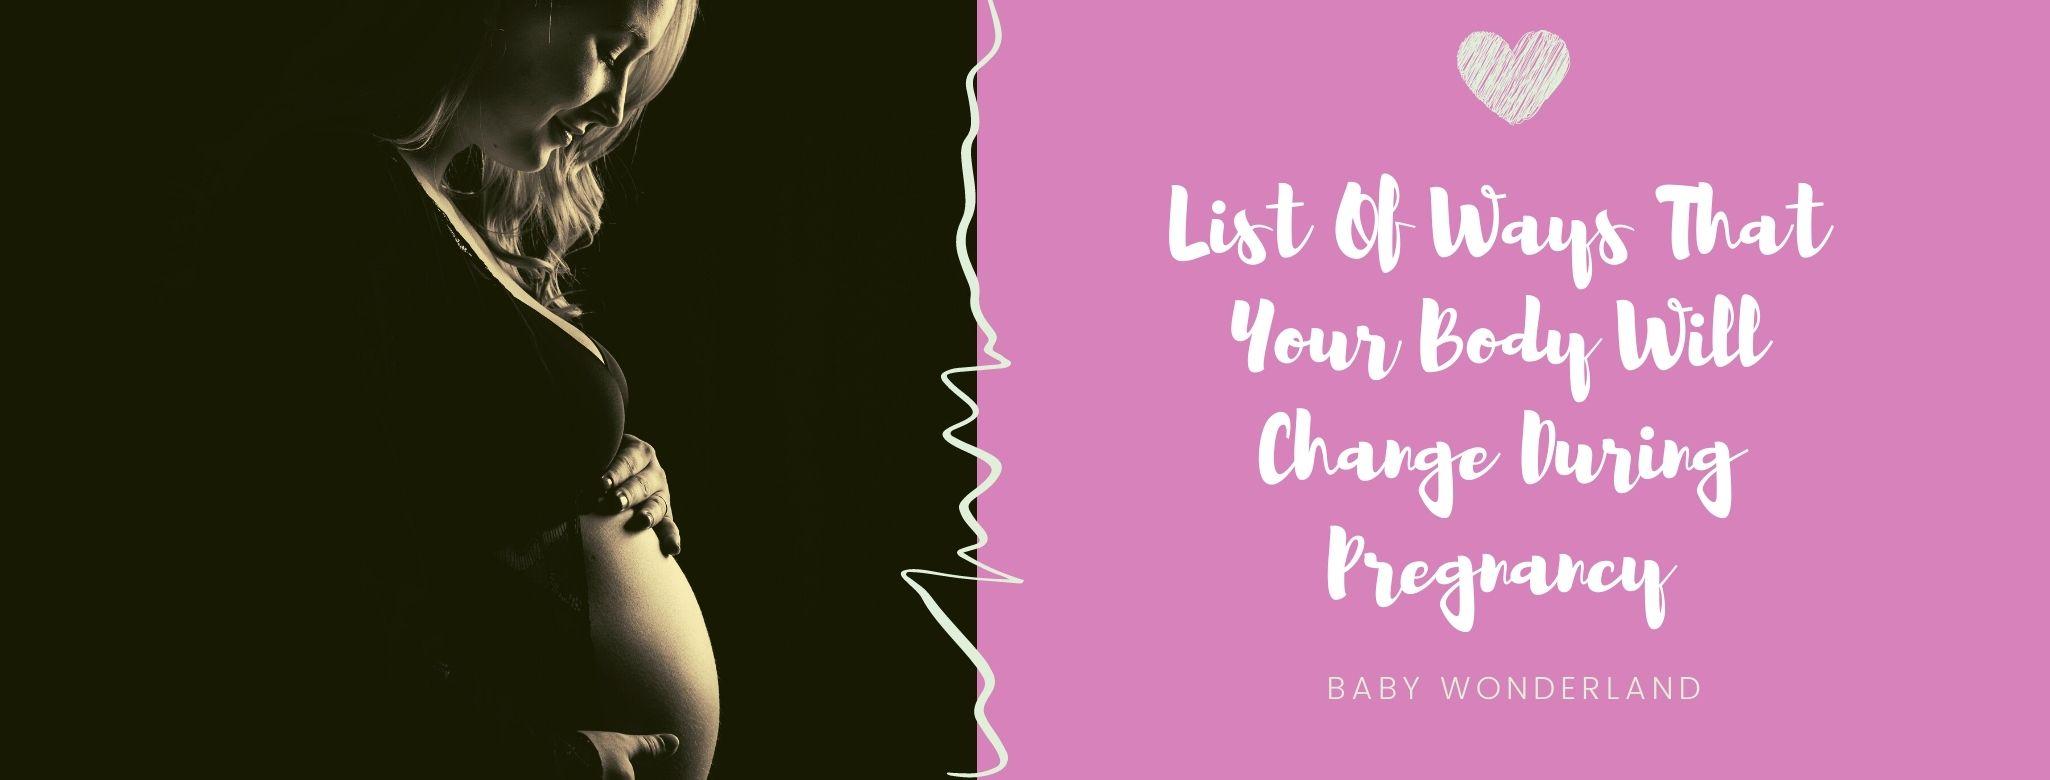 Pink Color Block Sale _ Promo Announcement Beauty Facebook Cover